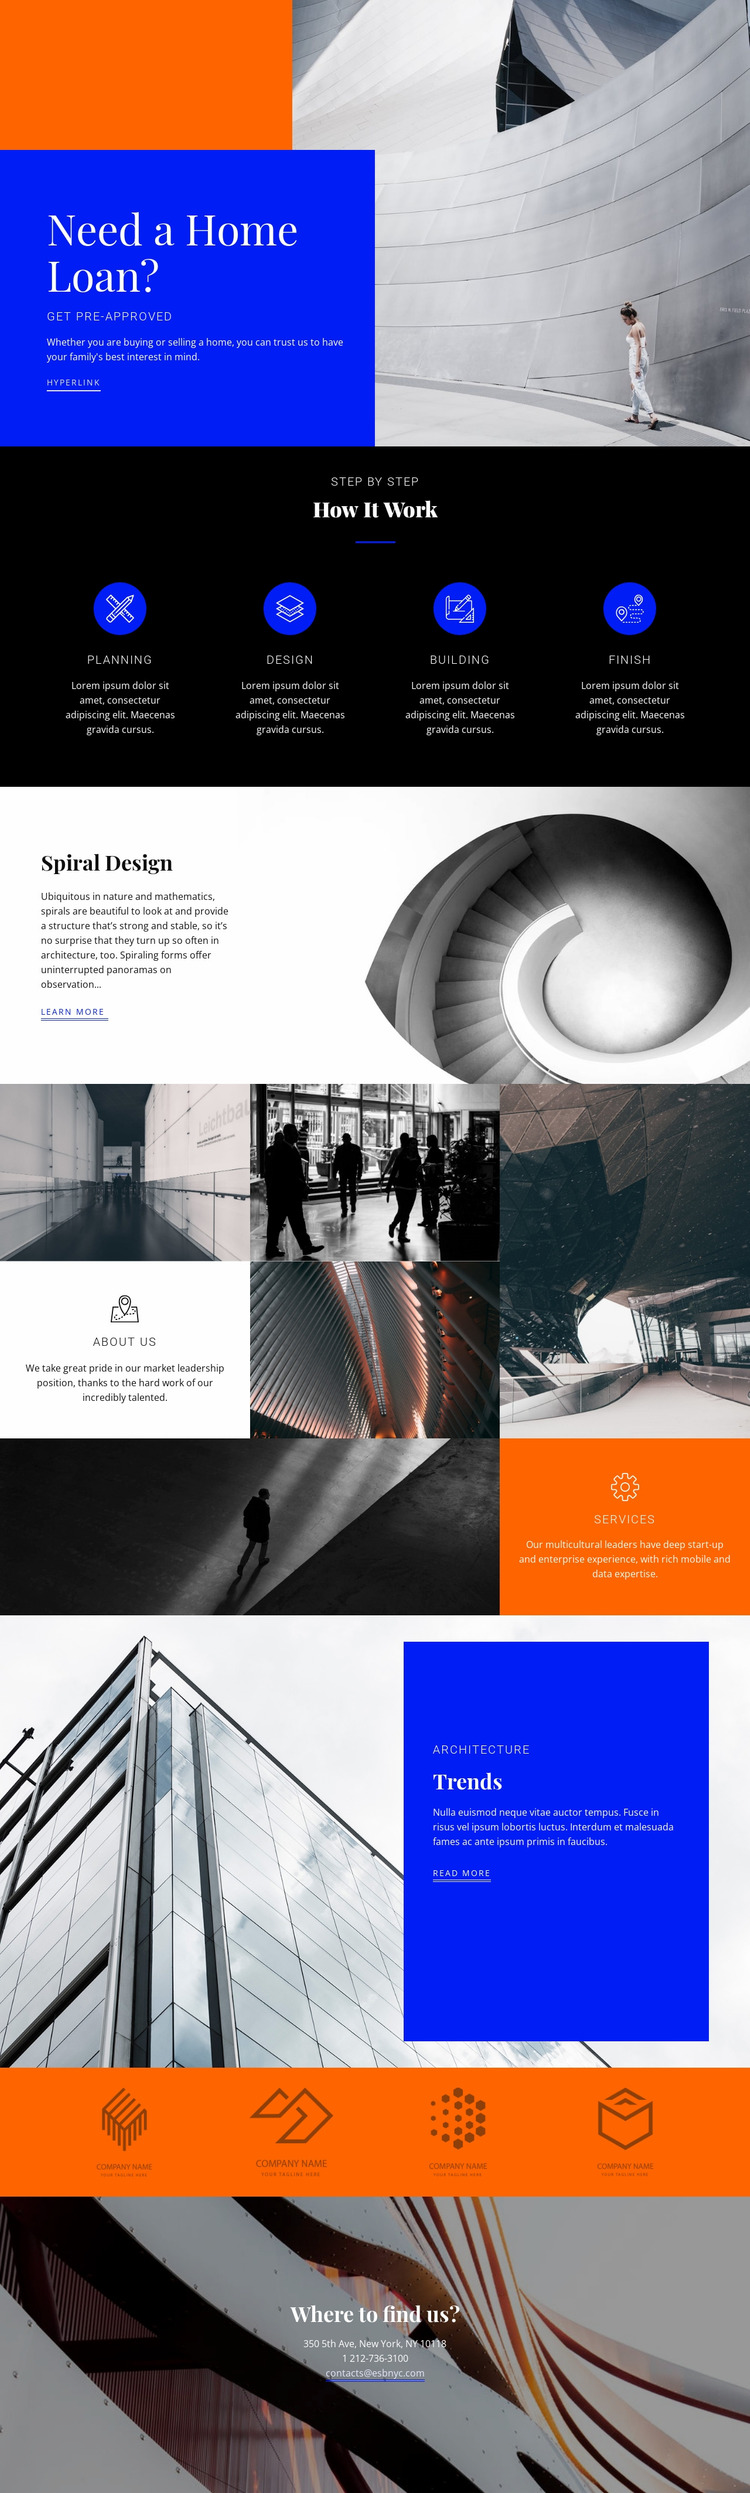 Local real estate agency Website Mockup